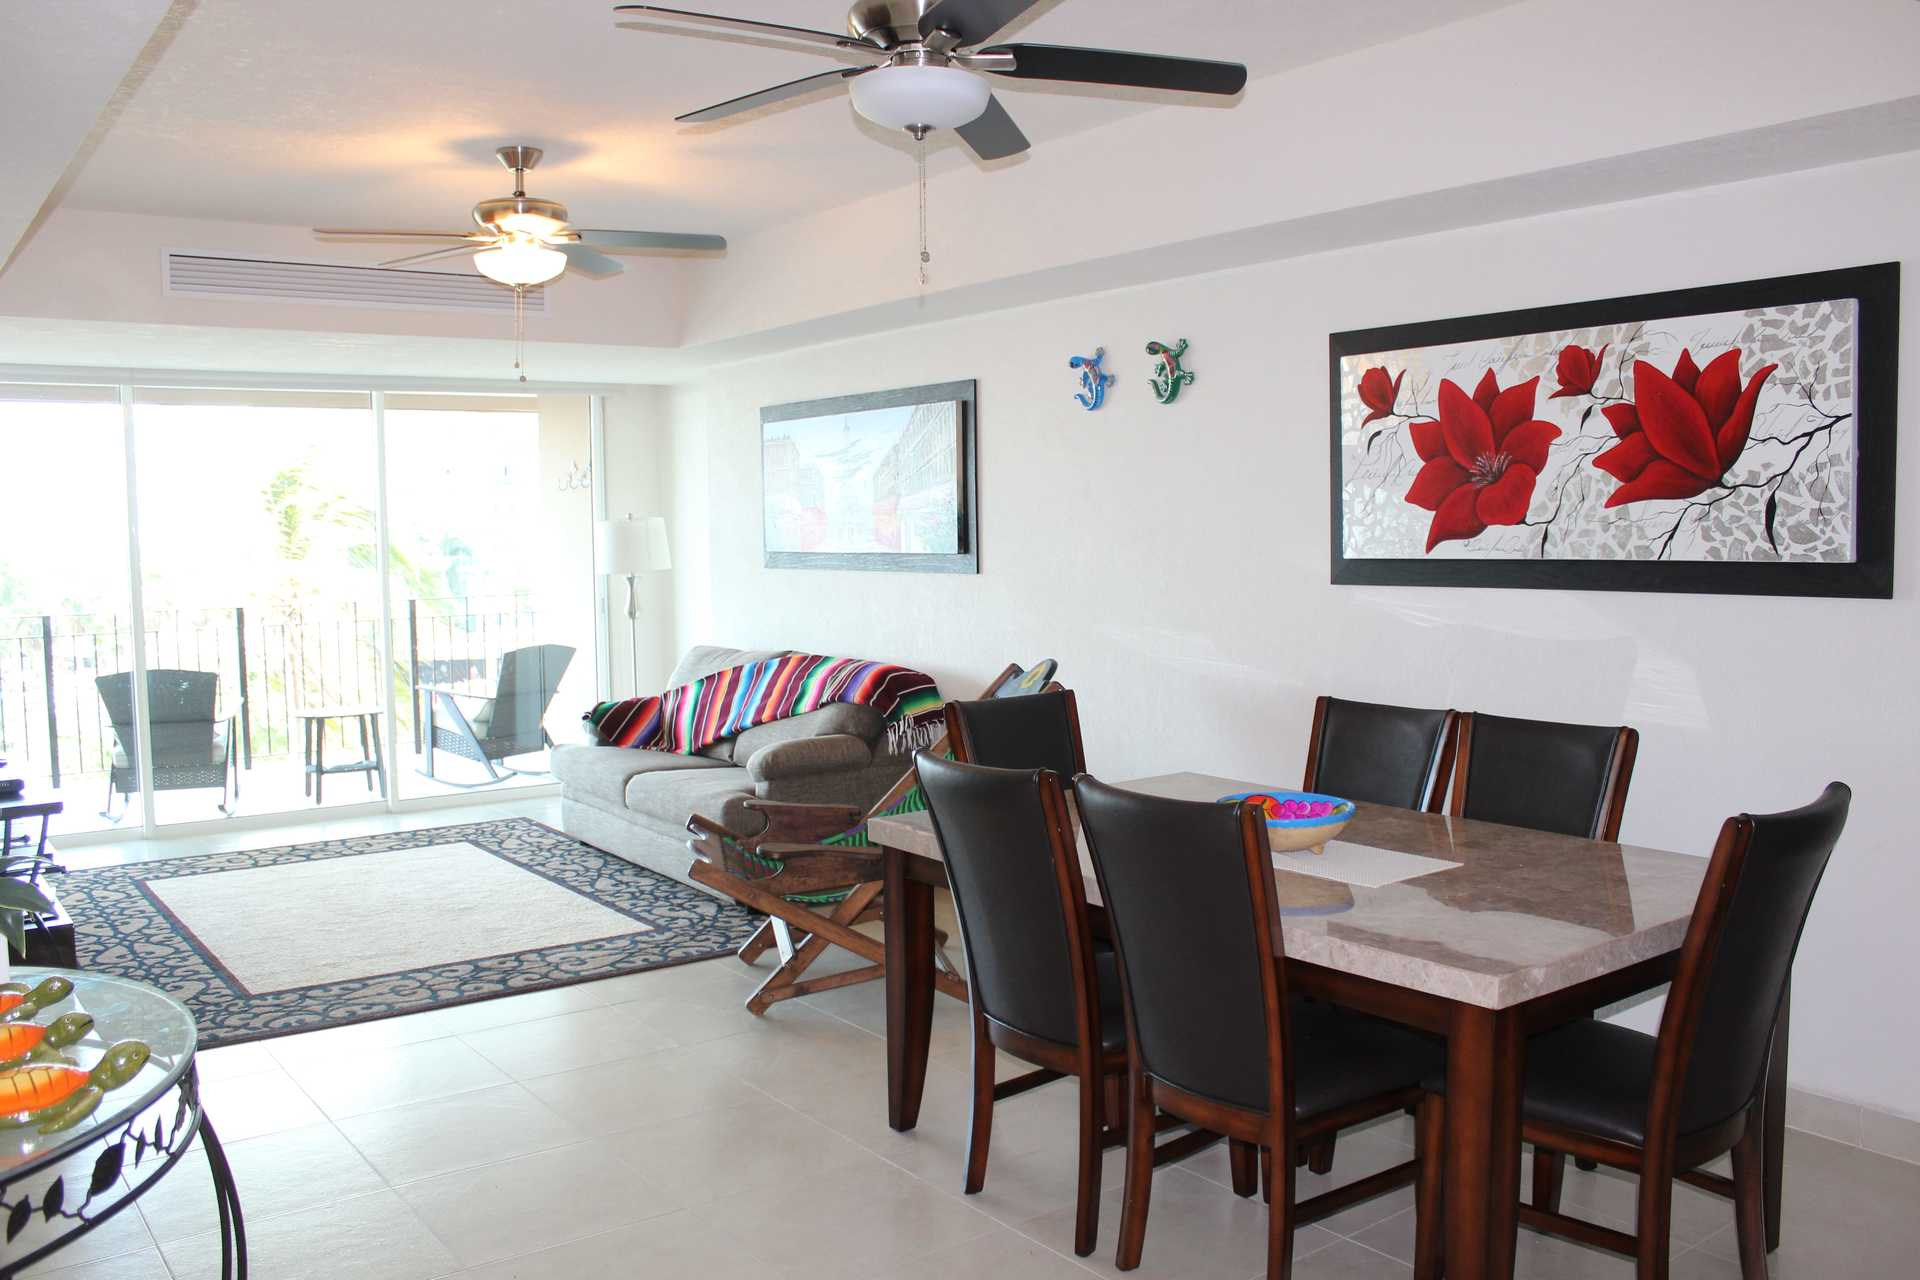 Modern and classy beachfront vacation condo for rent in The Grand Venetian Puerto Vallarta